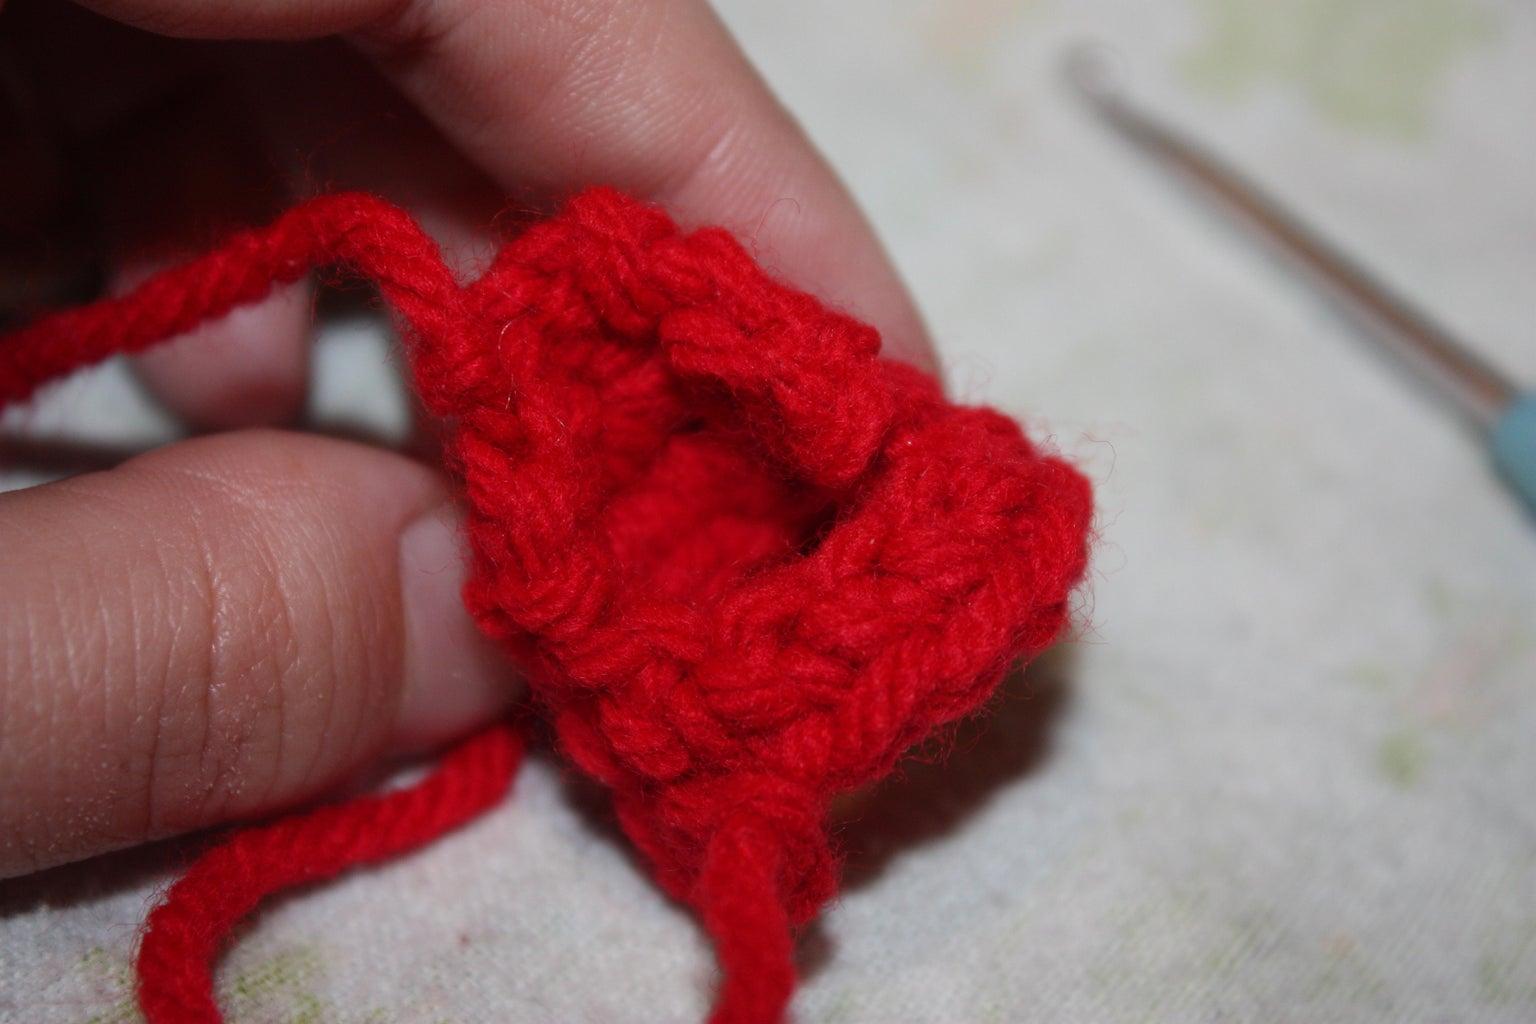 Step 3: Arms